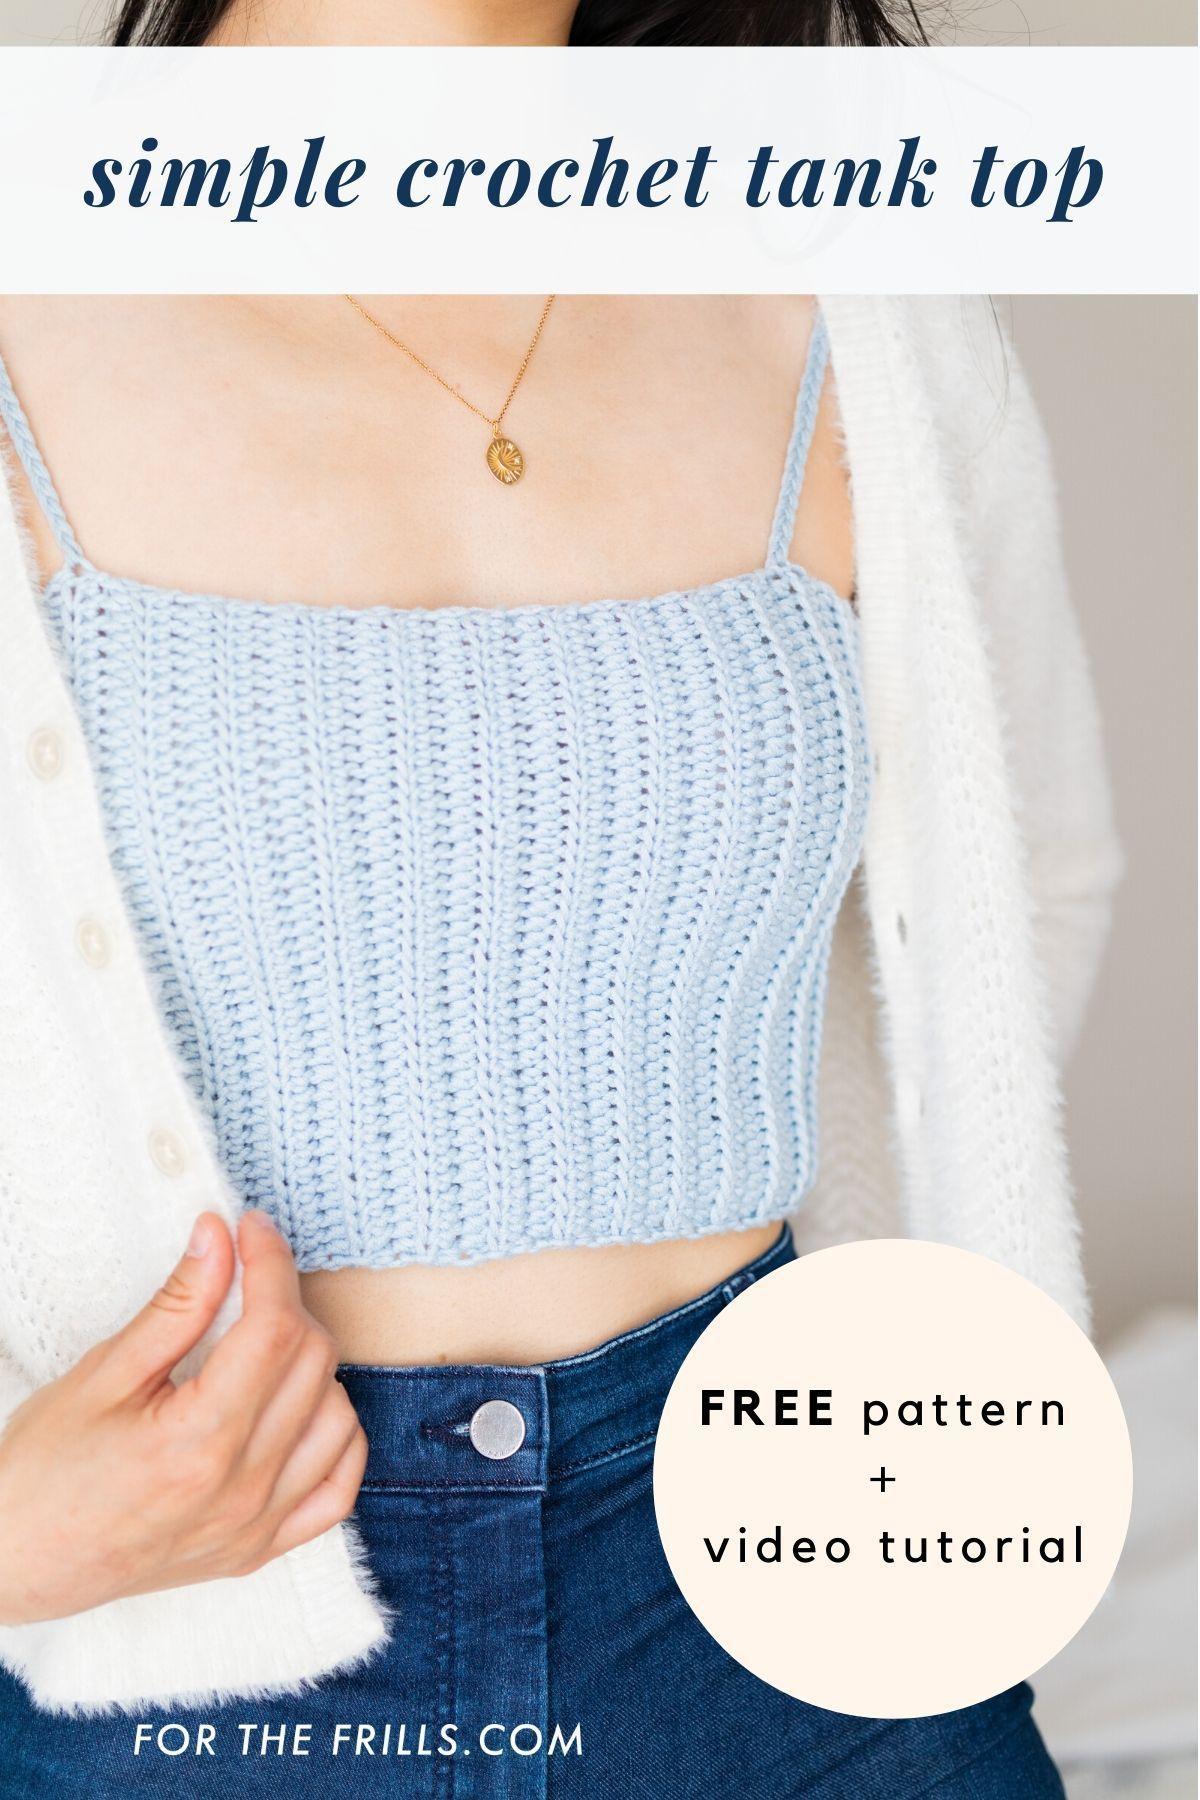 Beginner Crop Top for summer – free crochet pattern summer diy